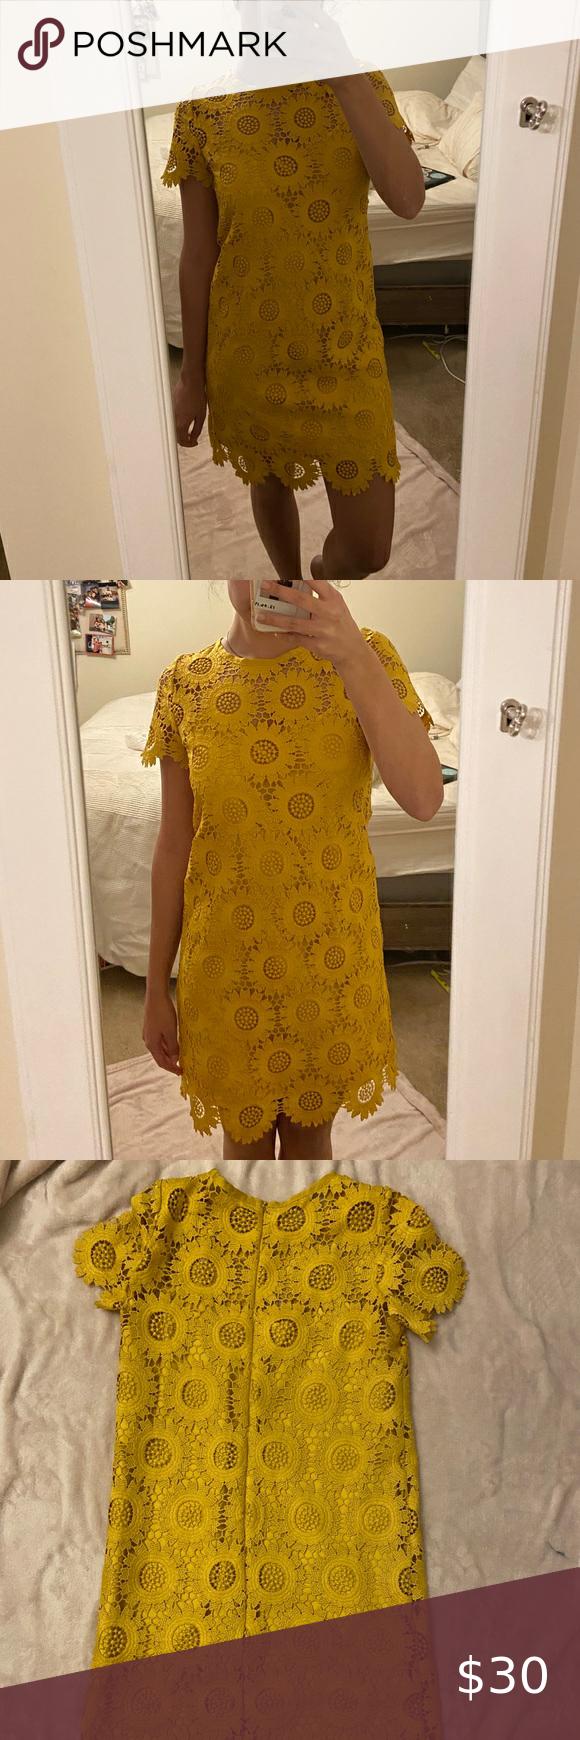 Sunflower Yellow Boho Sundress Boho Sundress Yellow Dress Sundress [ 1740 x 580 Pixel ]